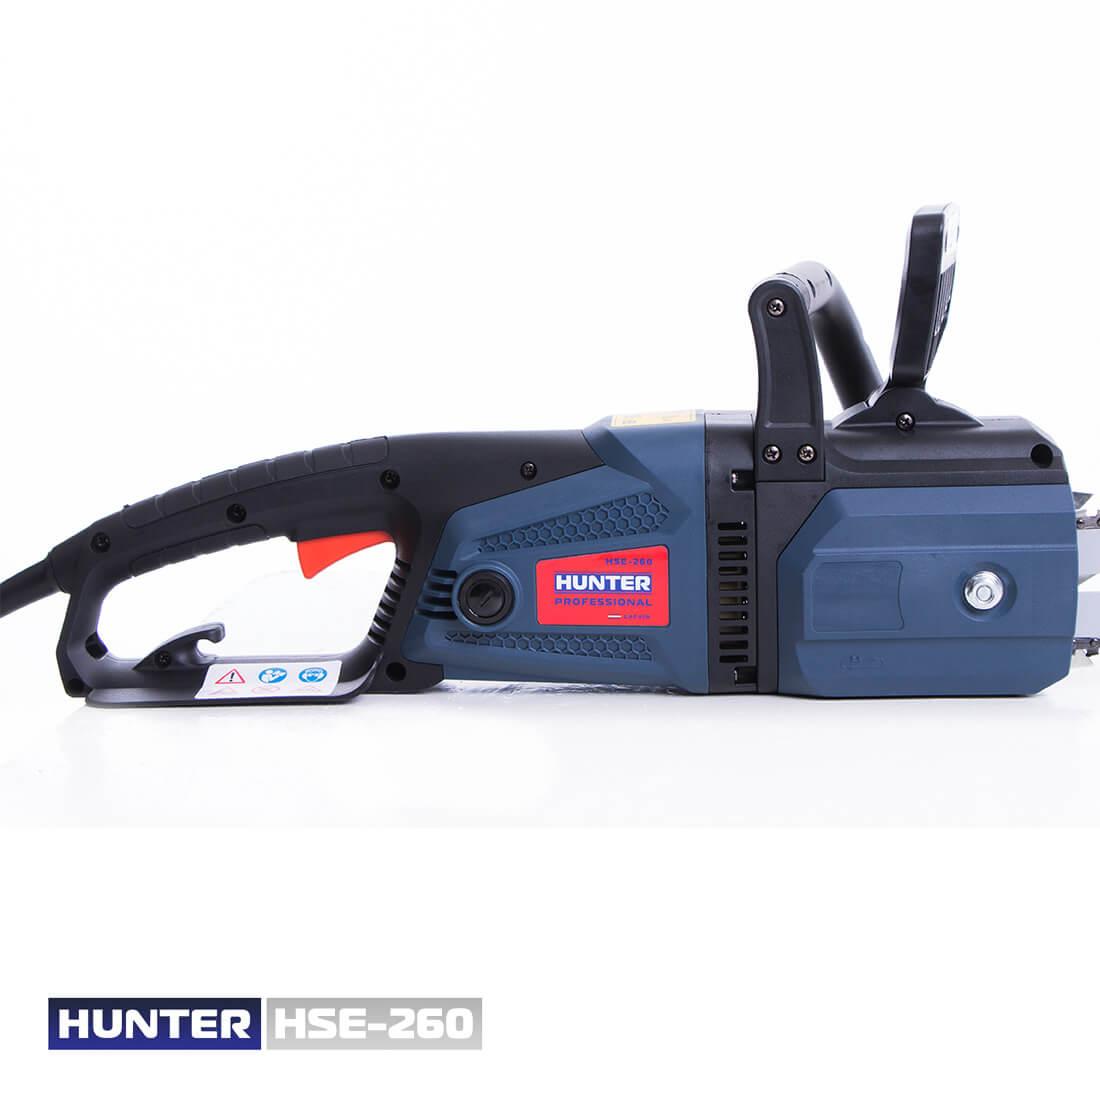 Фото Hunter HSE-280 цена 2700грн №6 — Hunter